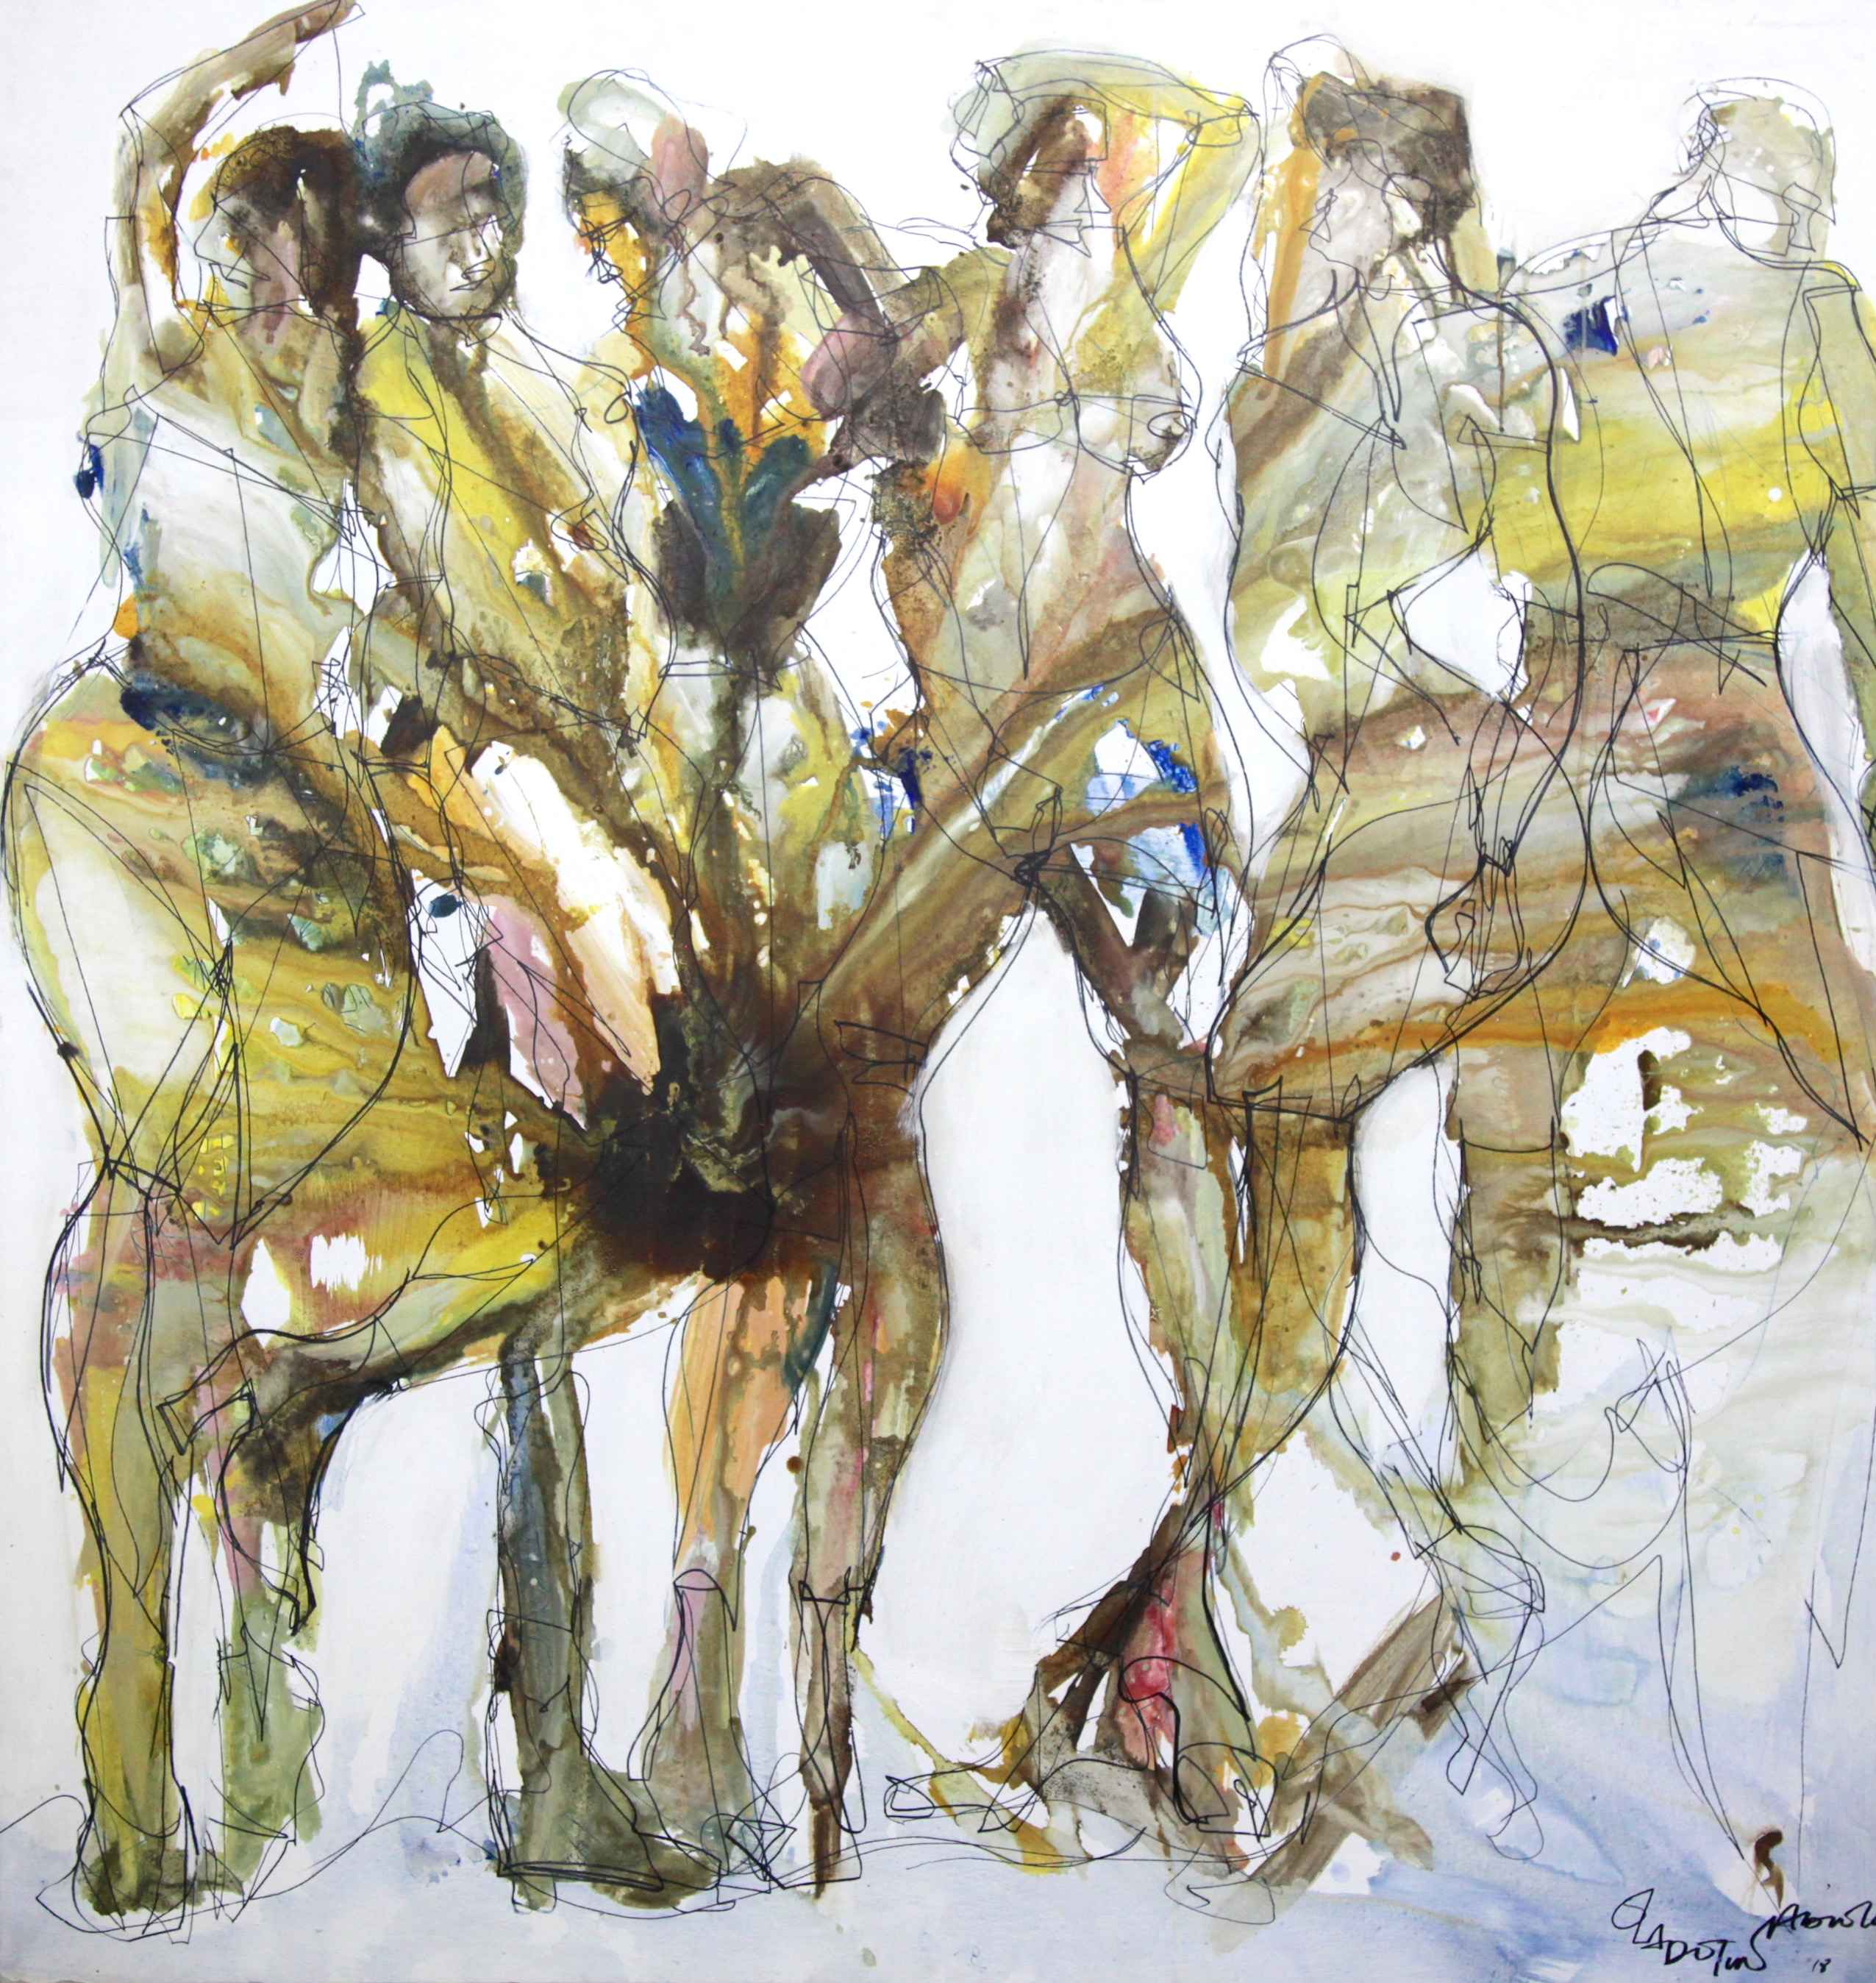 Strike A Pose by Mr Oladotun Abiola - Masterpiece Online